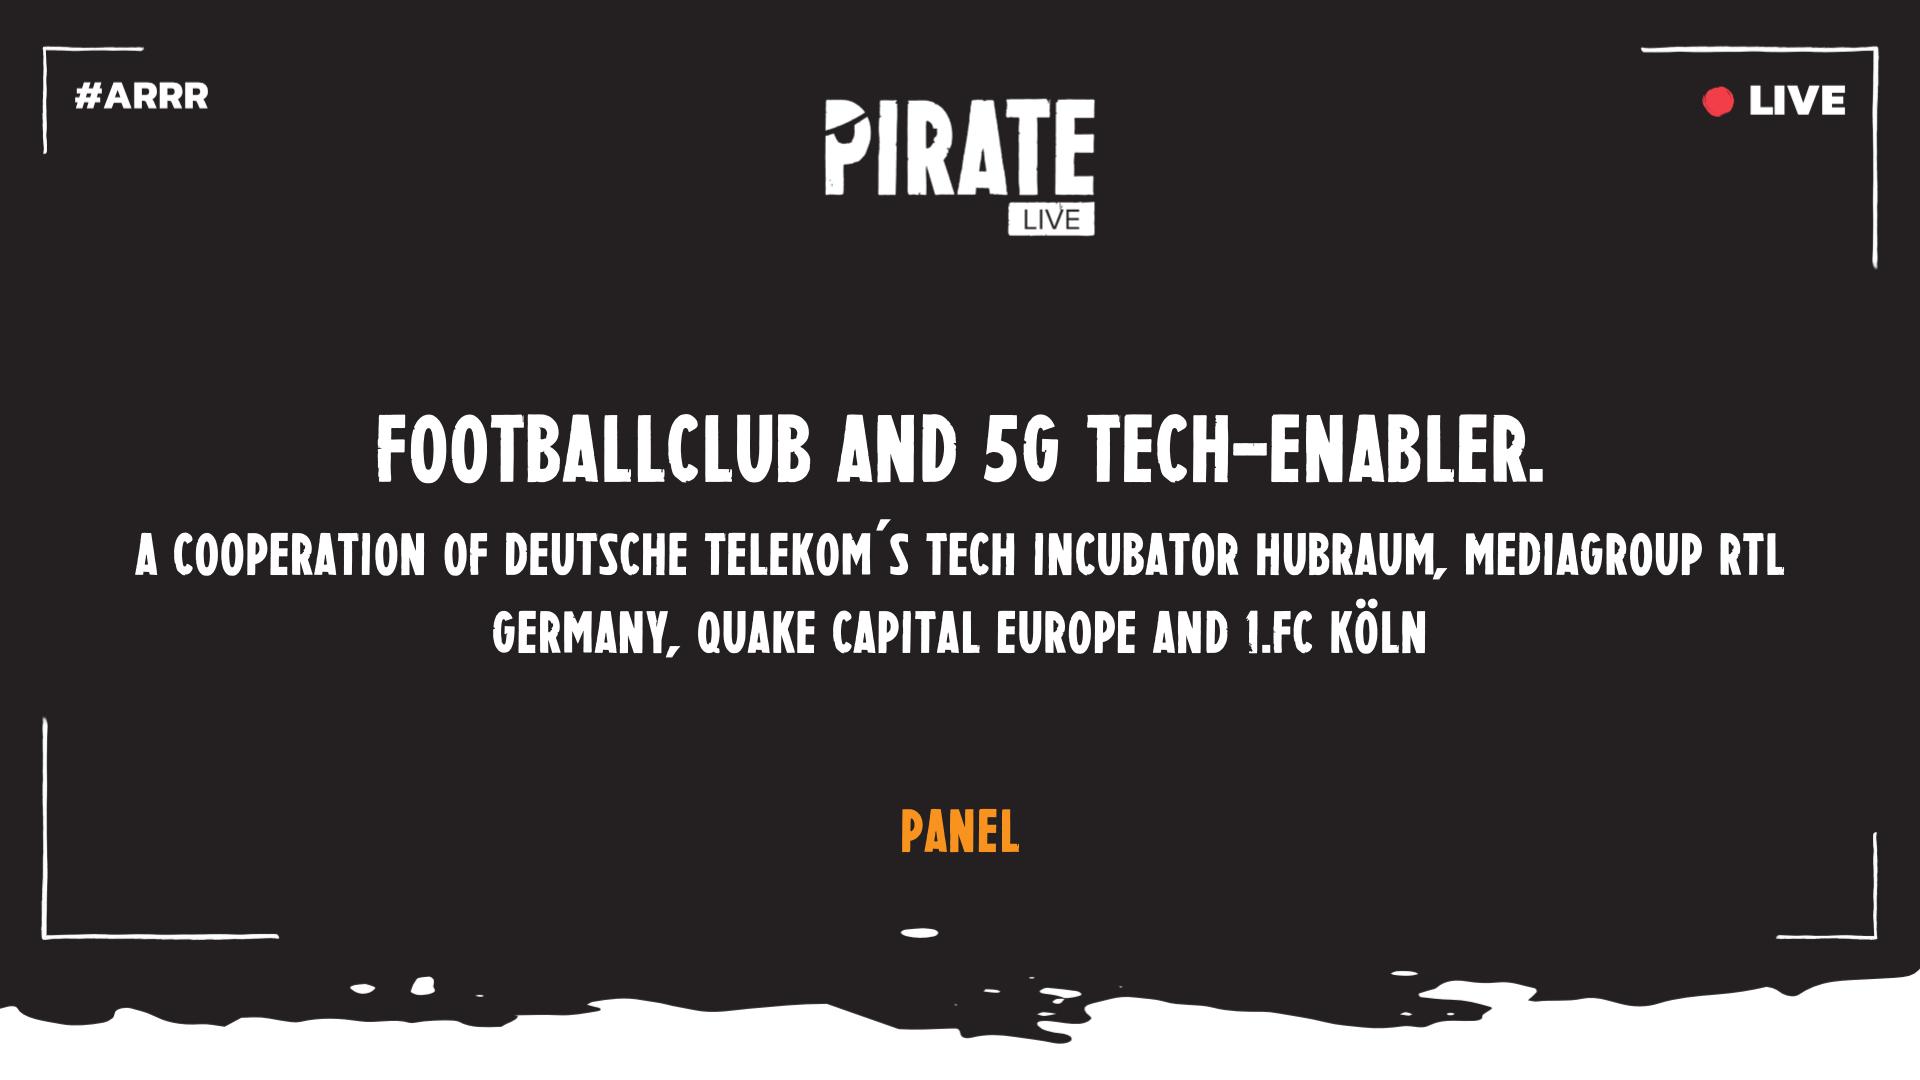 Footballclub and 5G tech-enabler